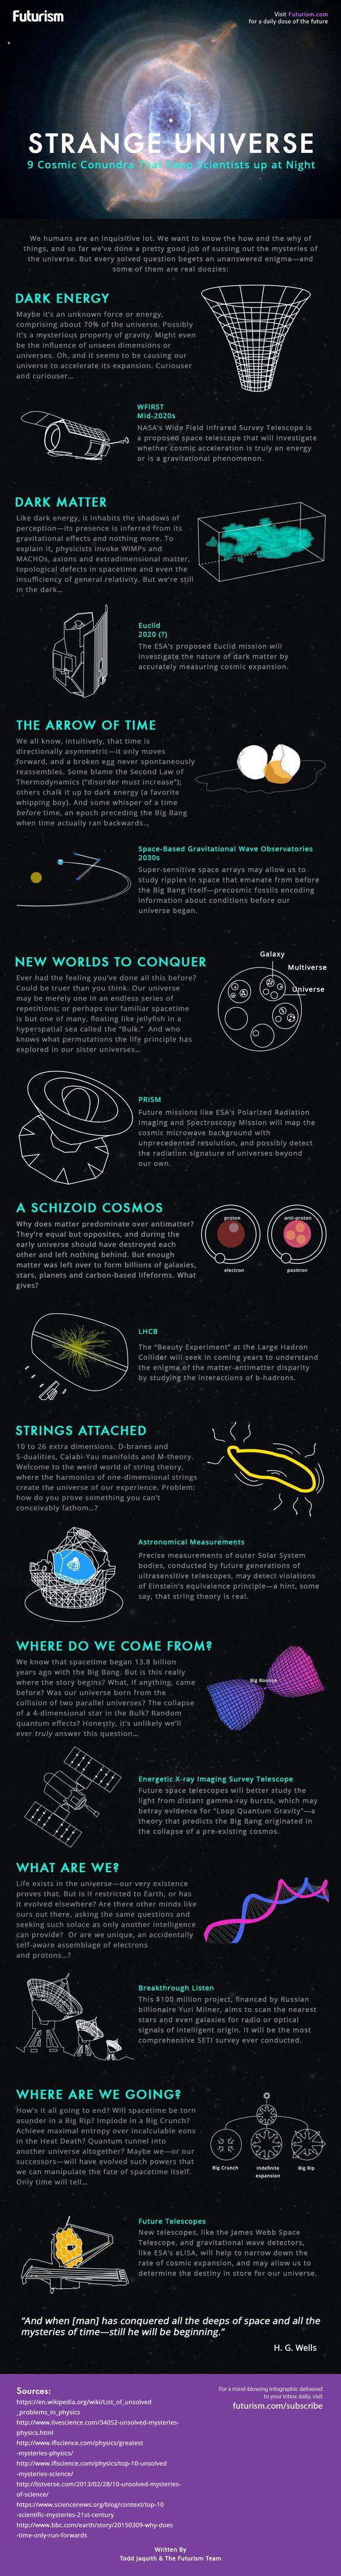 Dark energy, dark matter, string theory, the big crunch ...